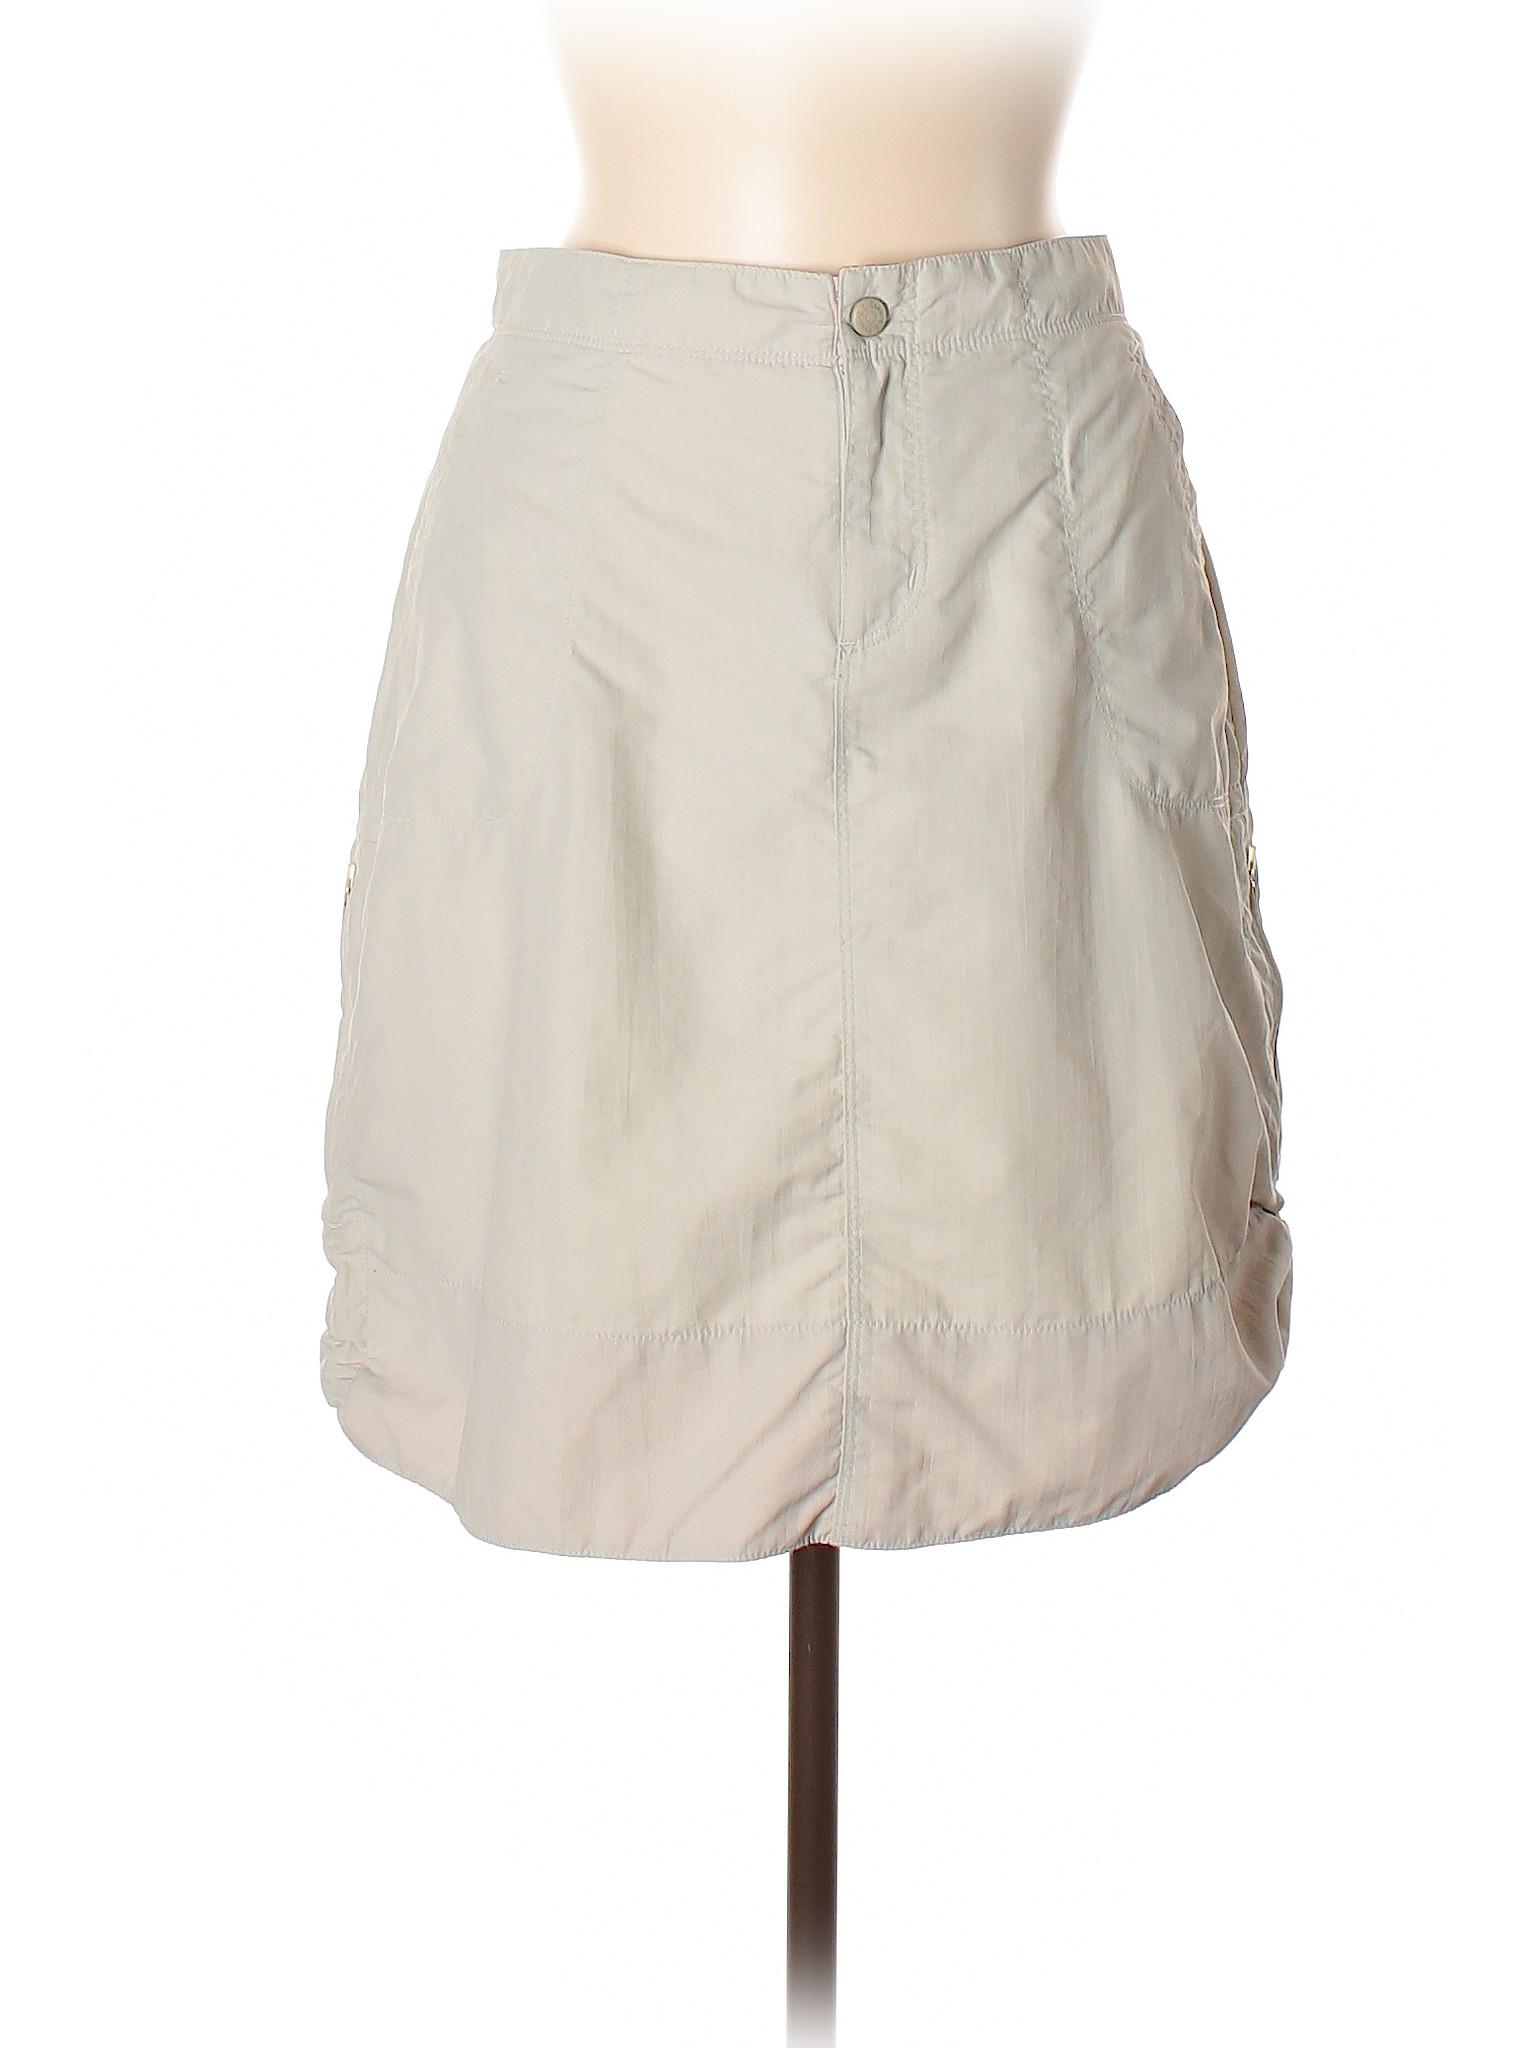 Boutique Casual Casual Boutique Skirt 6qxdvpw7